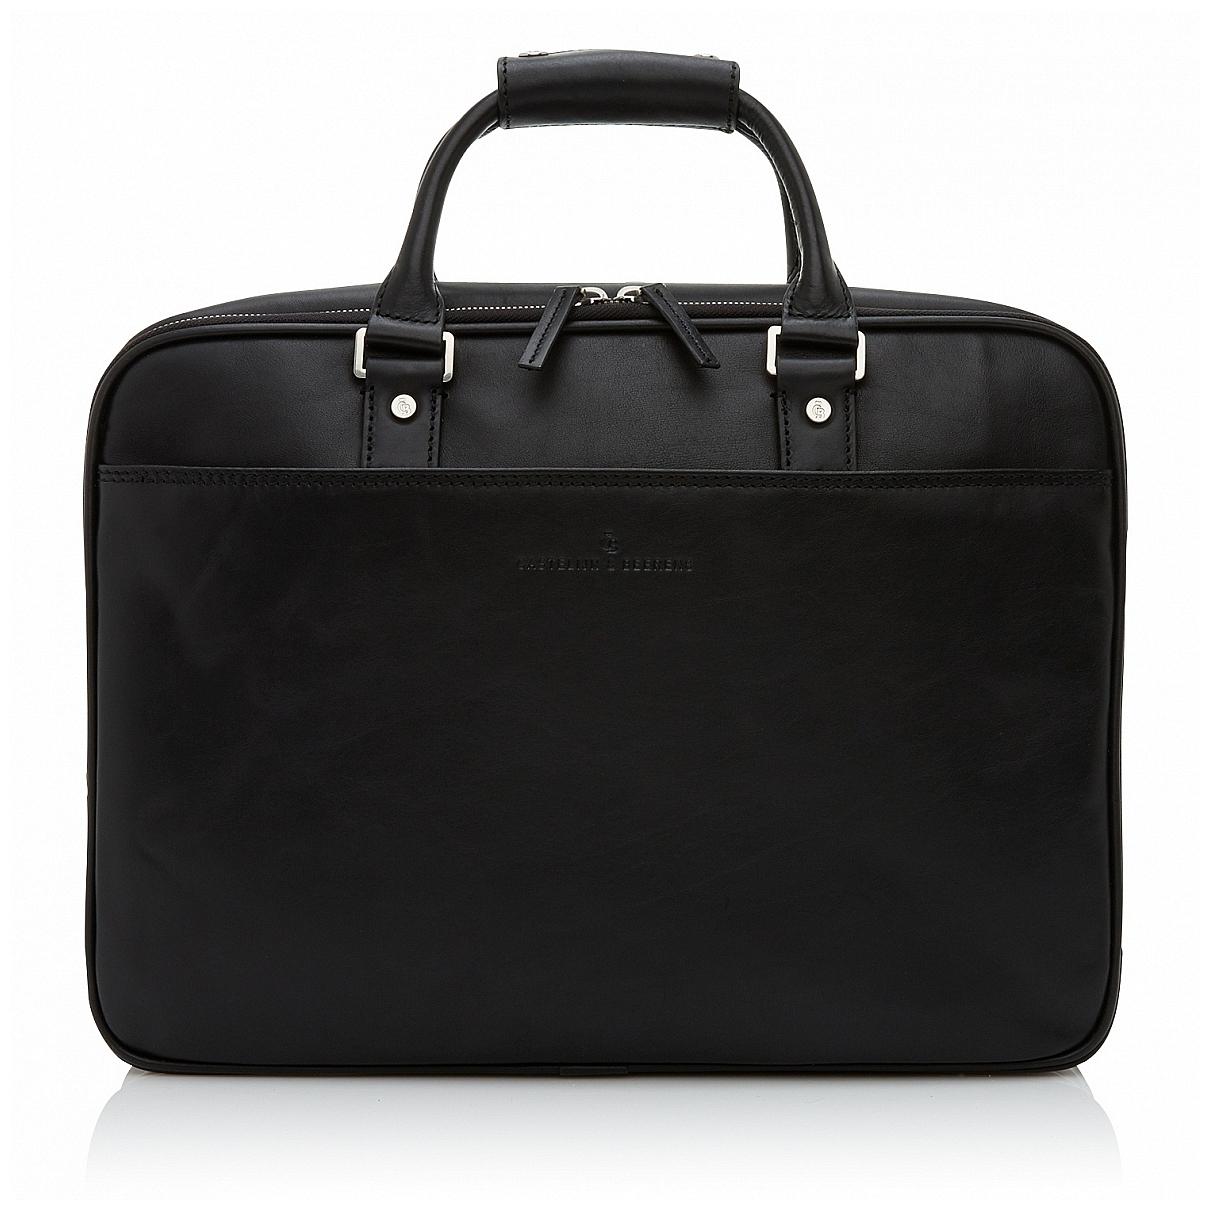 Castelijn & Beerens Kožená taška na notebook a tablet 689476 černá